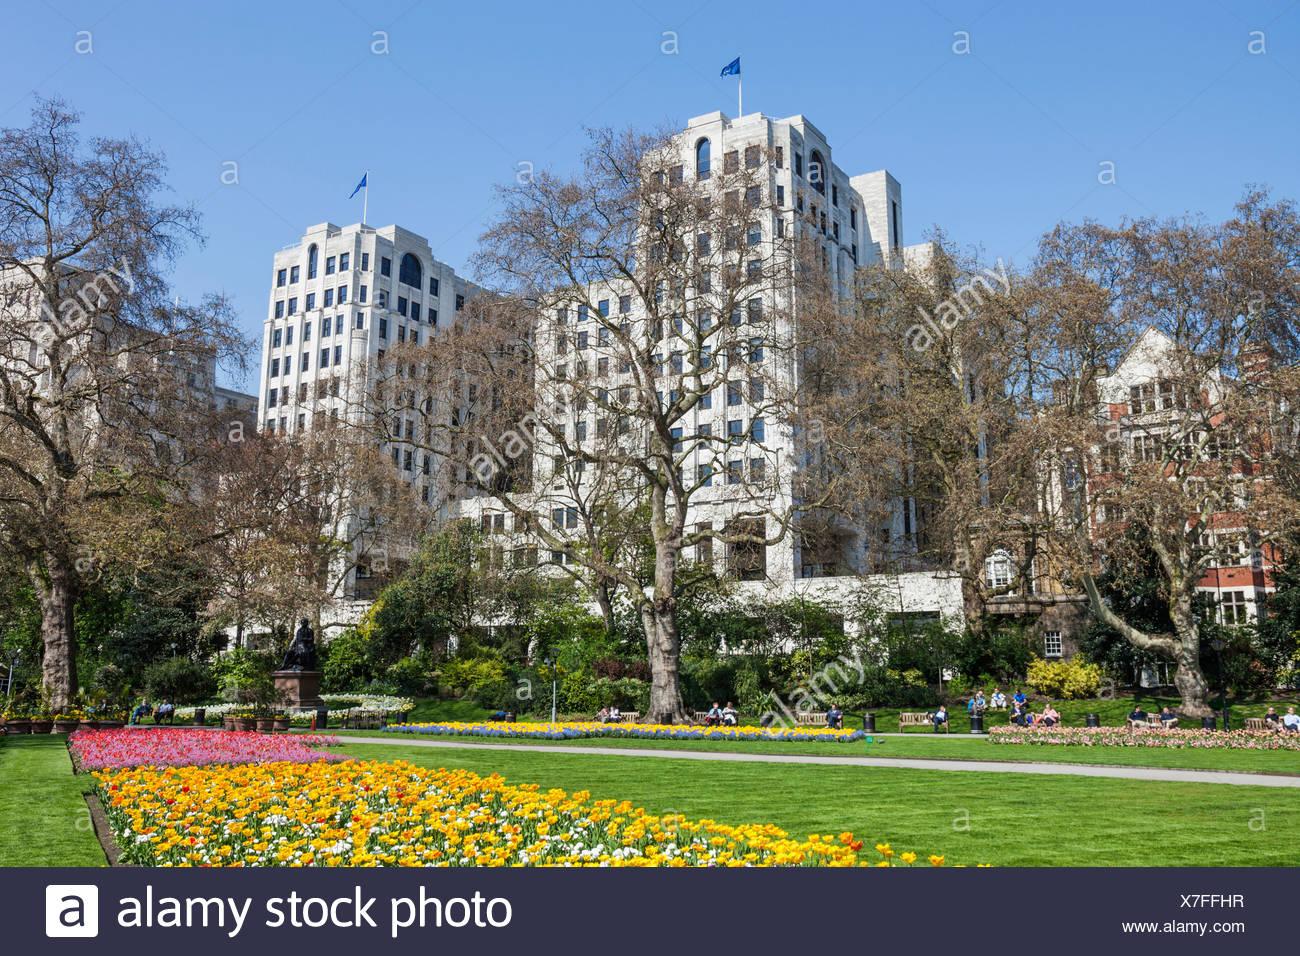 England, London, Embankment Gardens, Spring Flowers - Stock Image